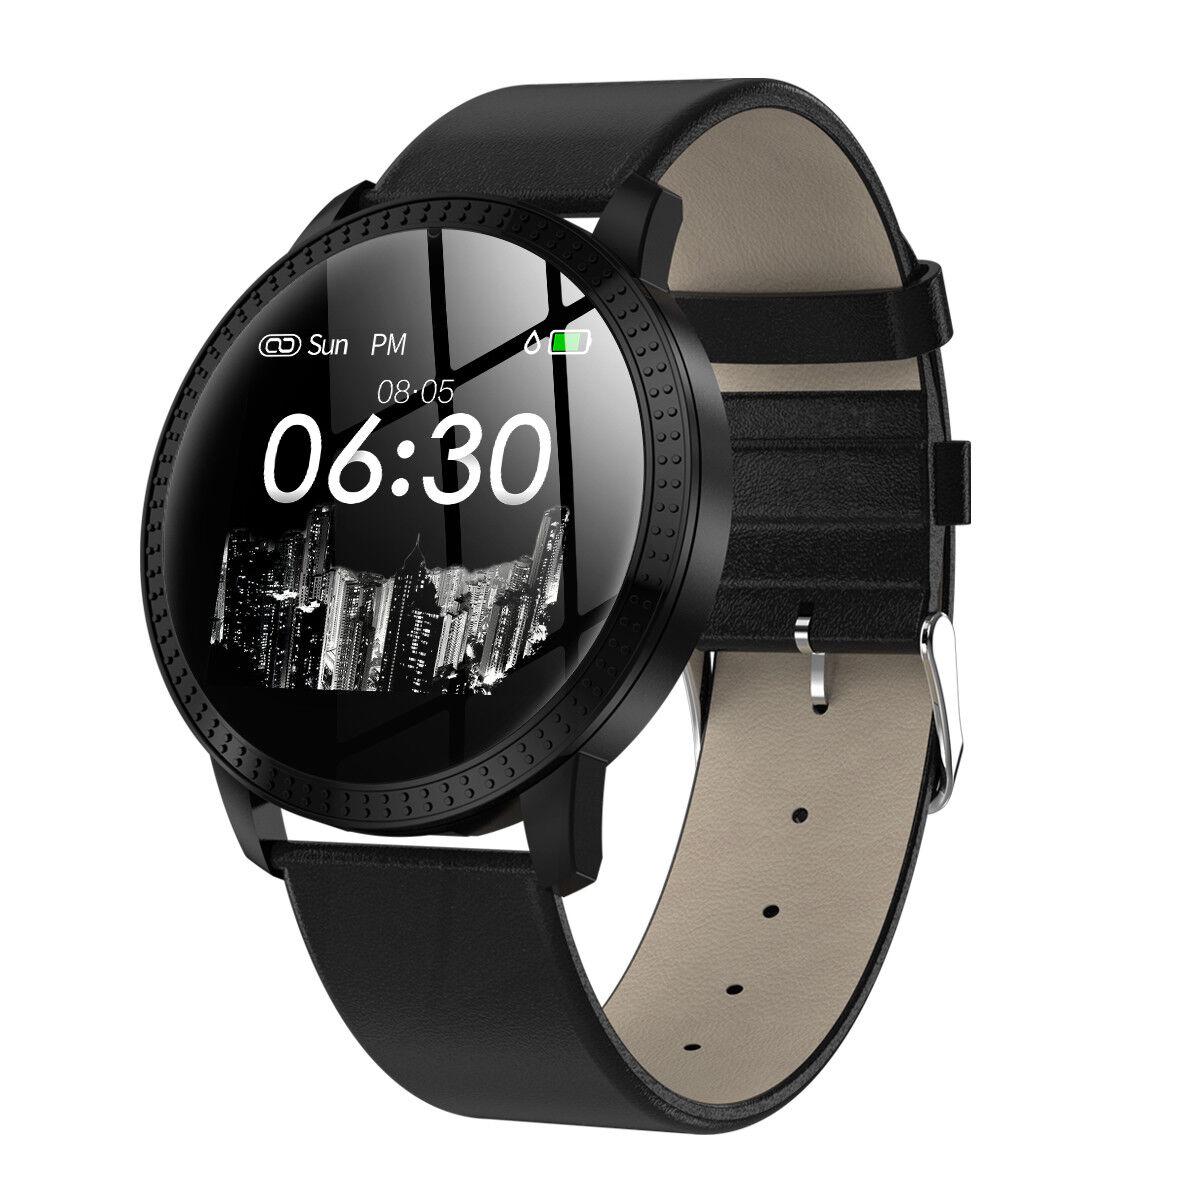 Smart Watch Fitness Tracker Heart Rate Blood Pressure Waterproof Tempered Mirror 3